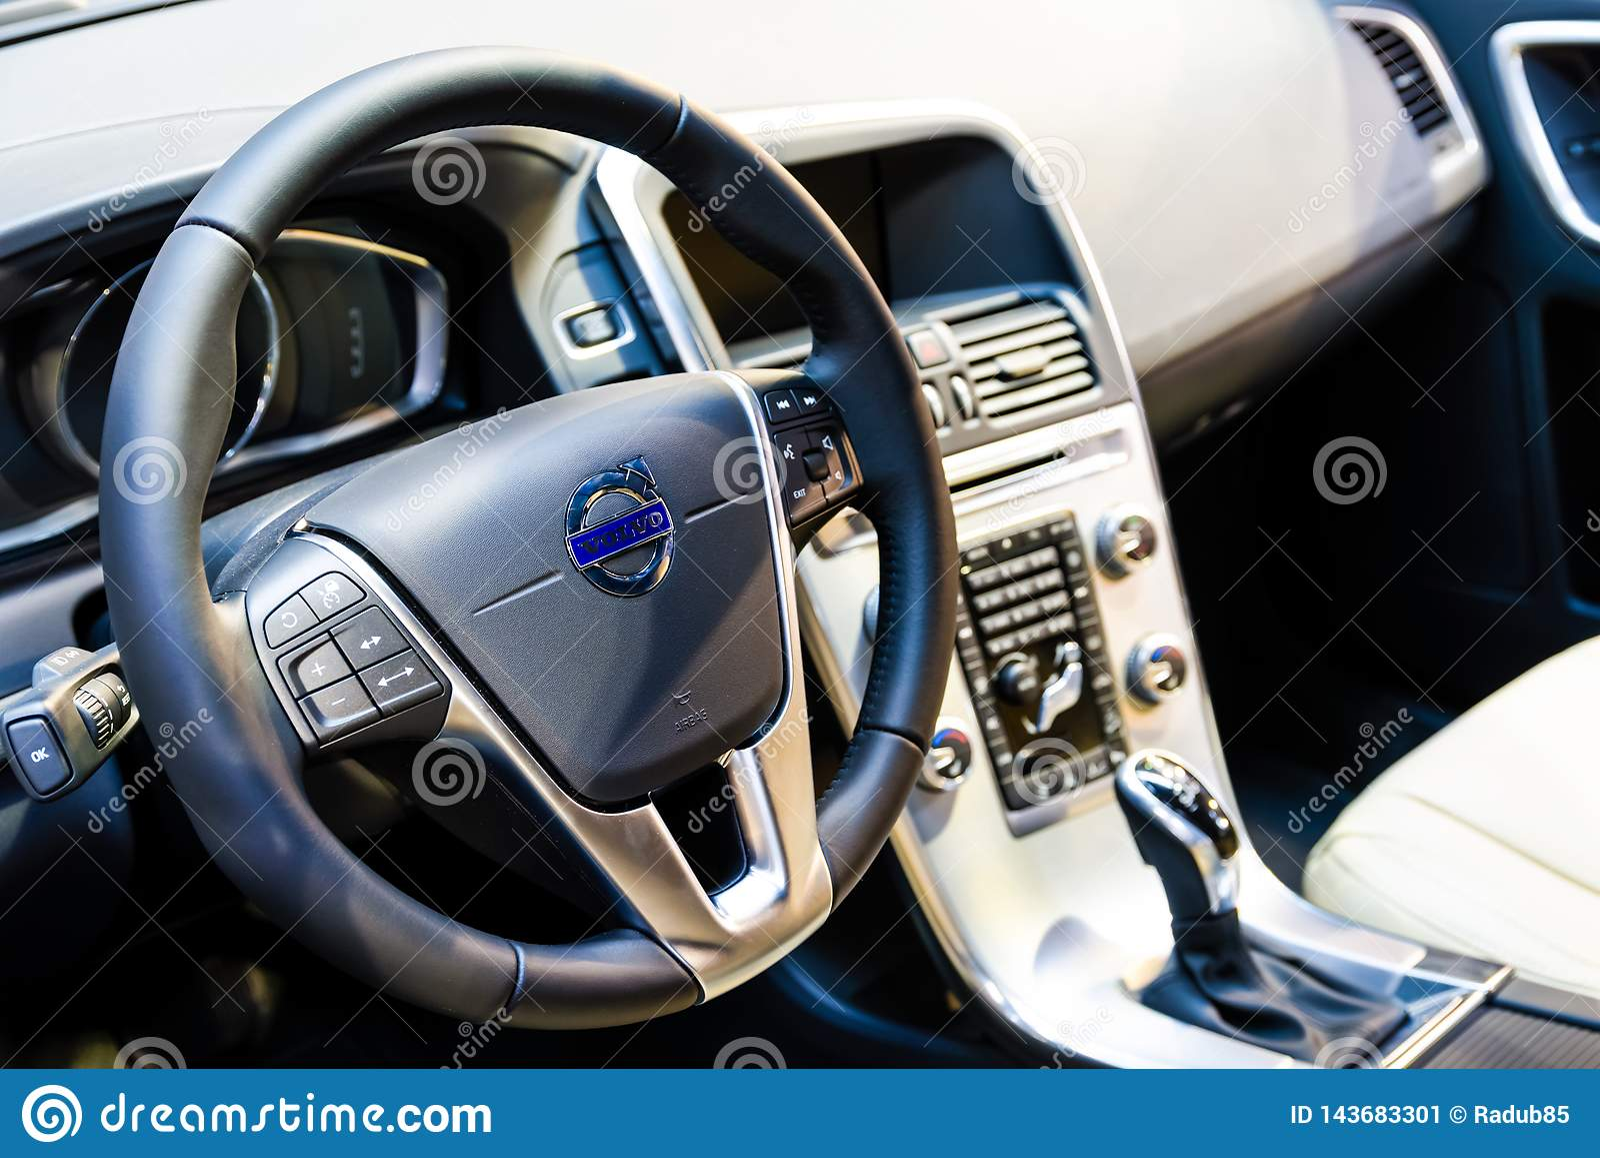 Interior Cockpit View Of Volvo Car Editorial Photo Image Of Design Light 143683301